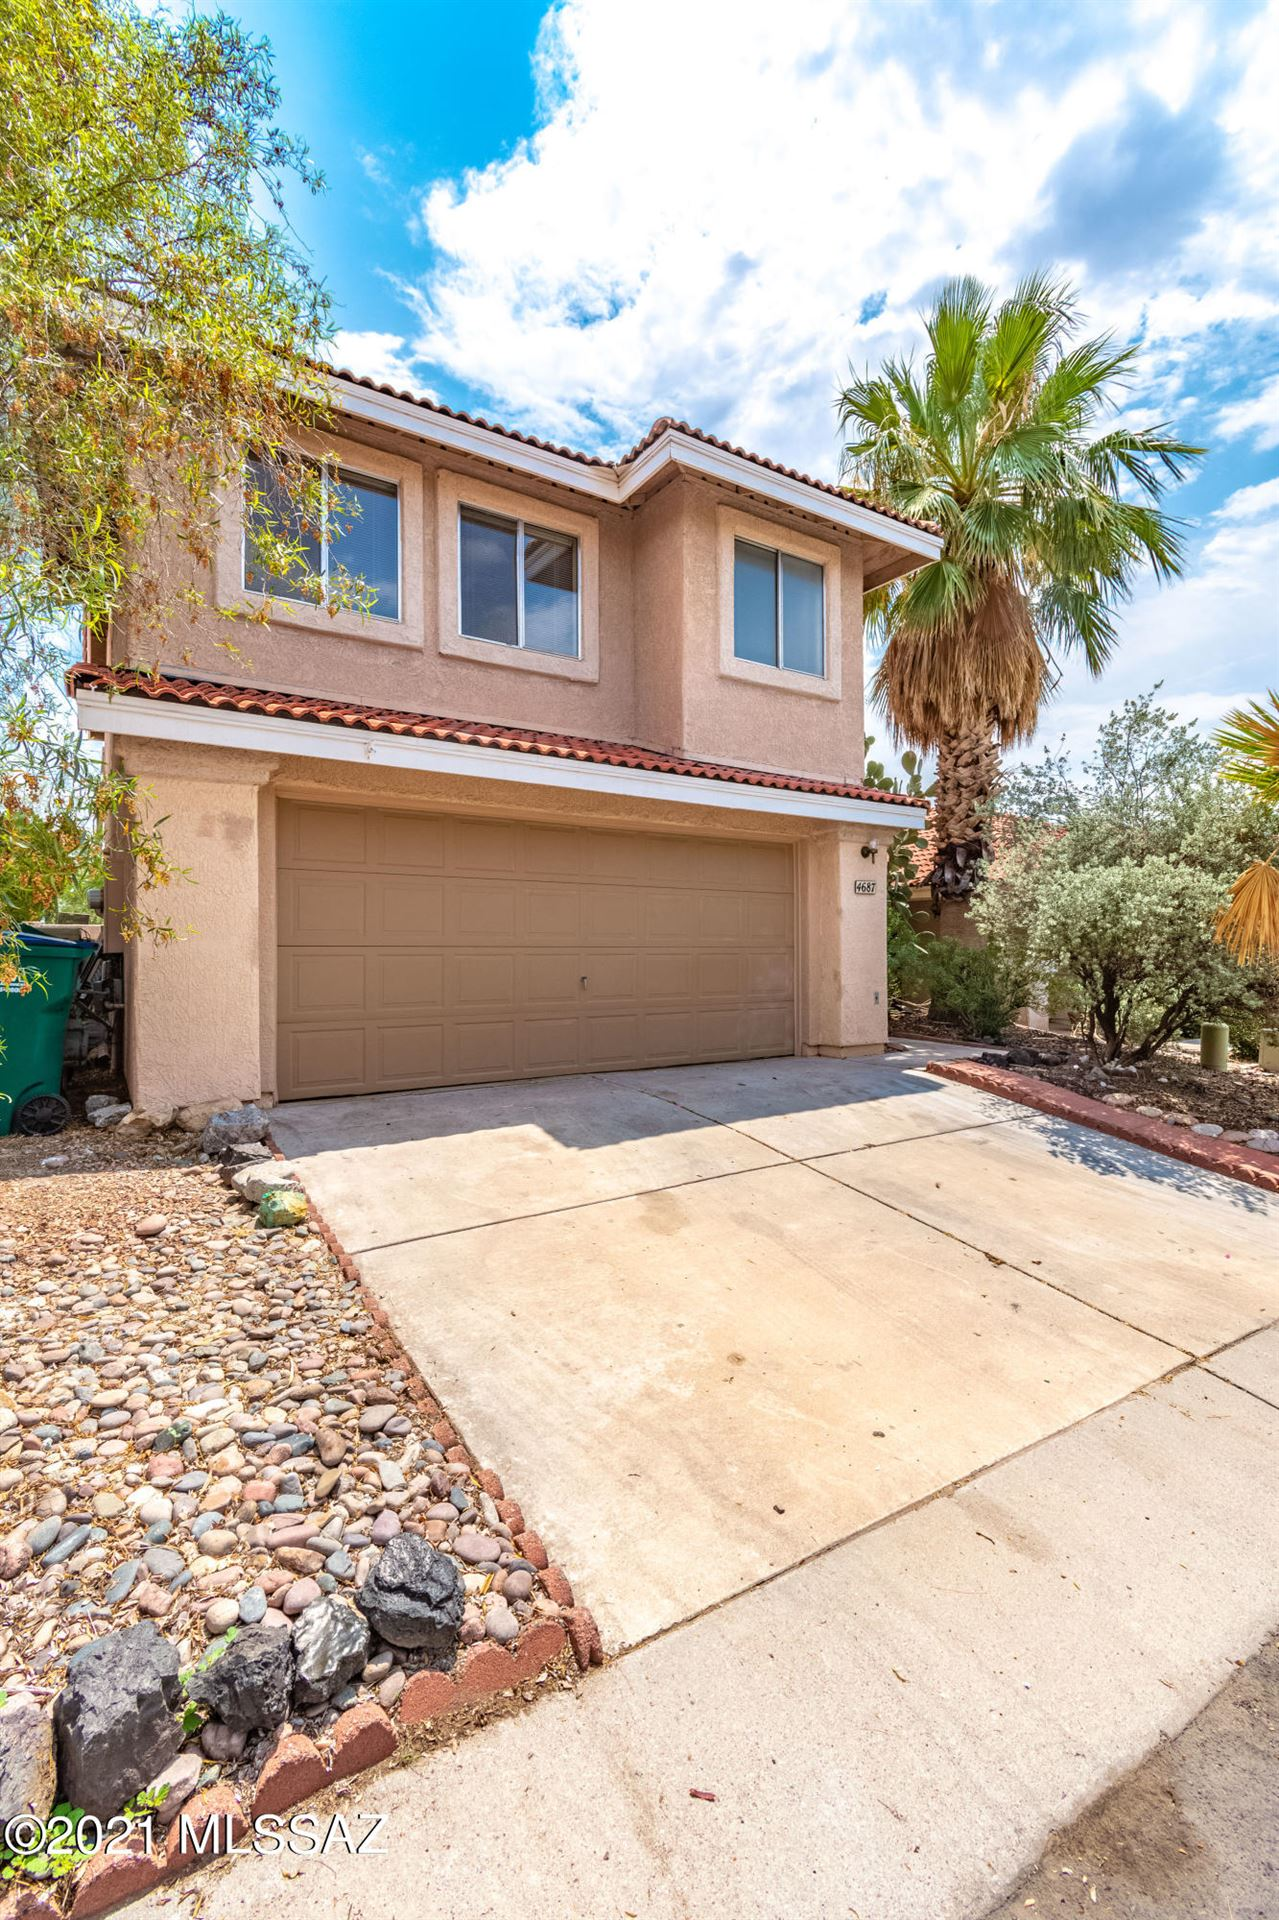 4687 W Knollside Street, Tucson, AZ 85741 - MLS#: 22118869